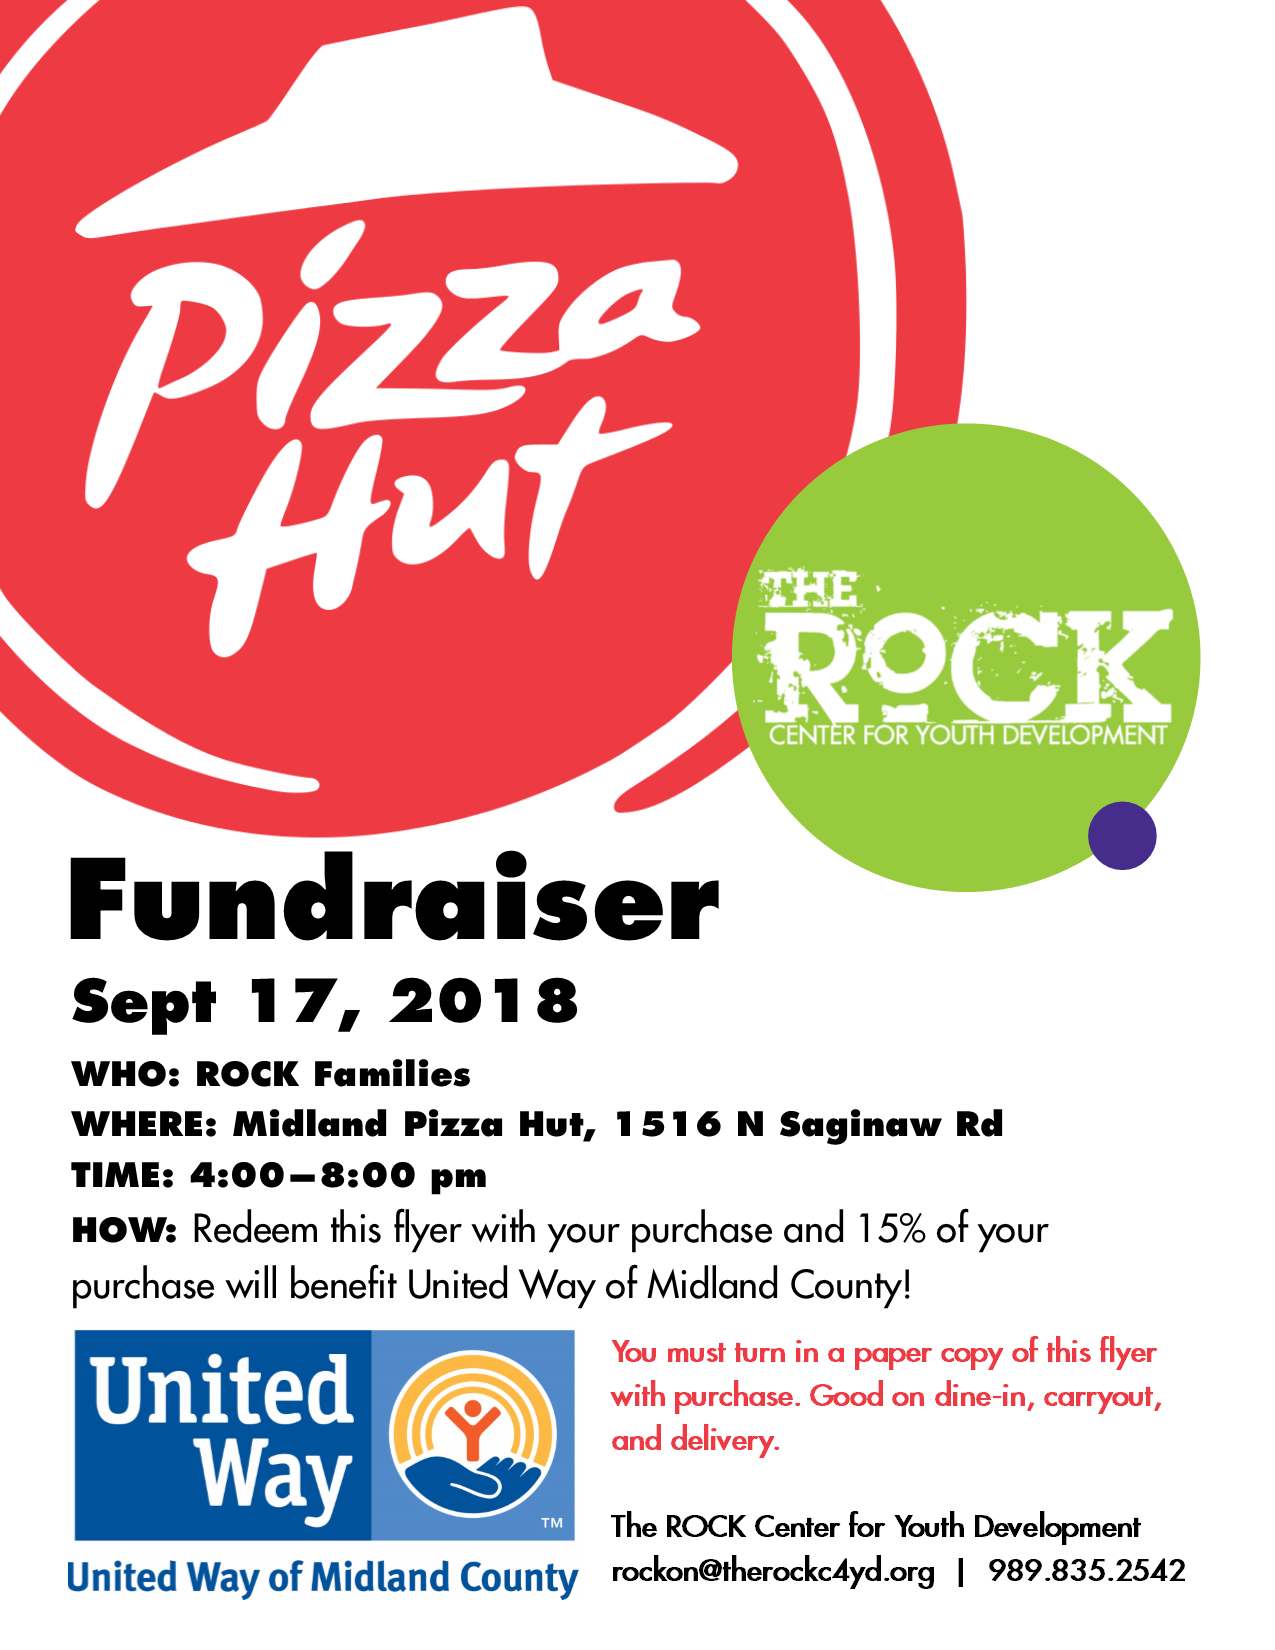 pizza hut fundraiser the rock c4yd rh therockc4yd org